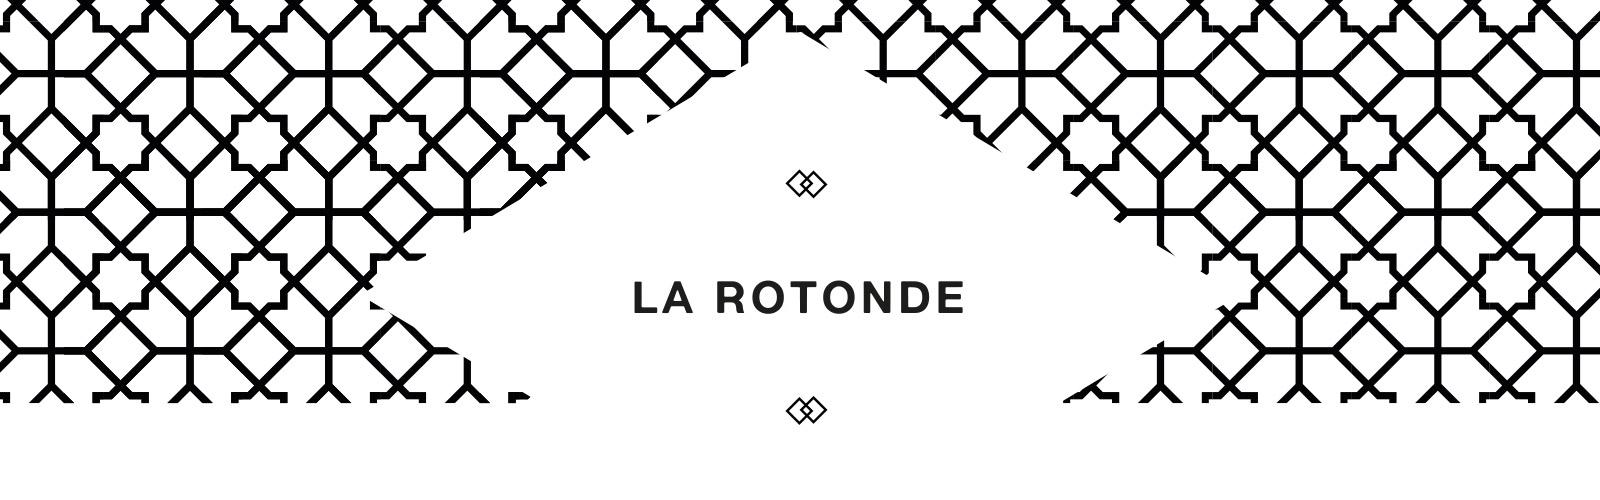 La Rotonde - Logotype